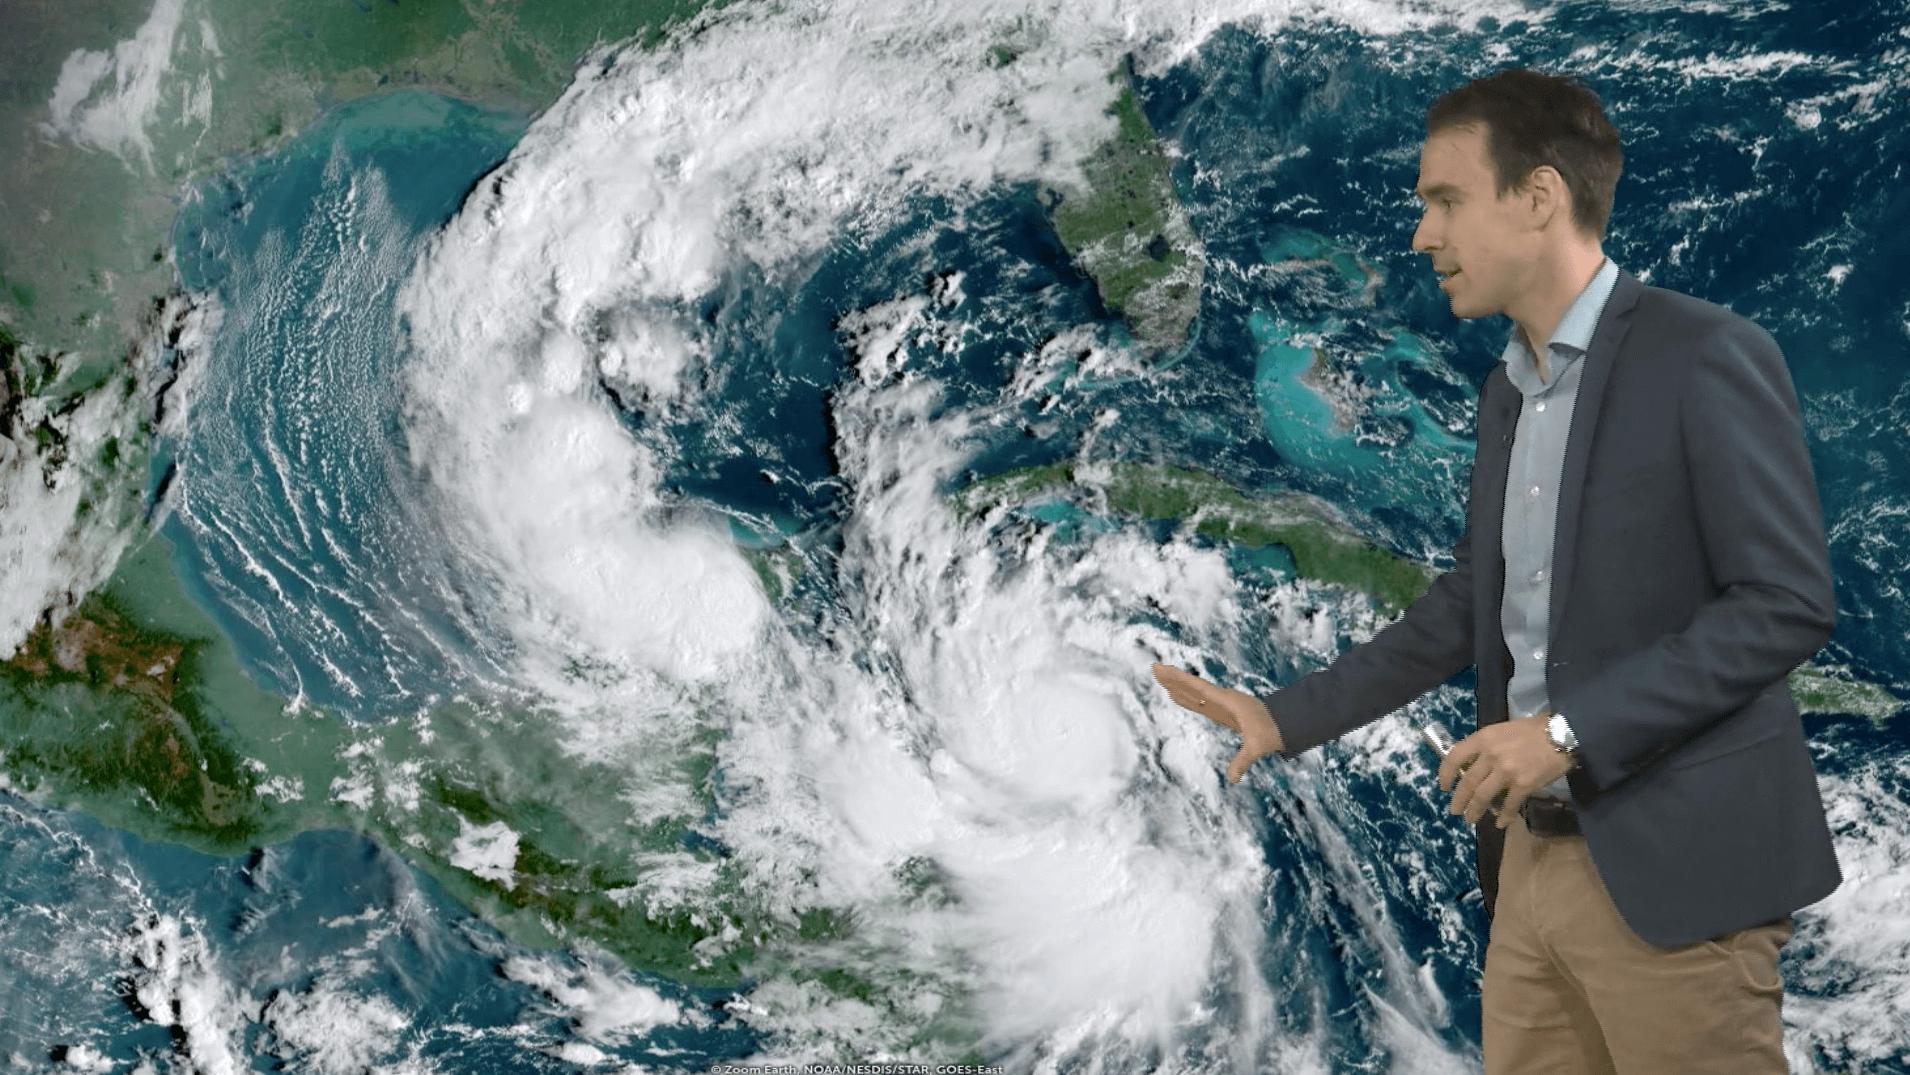 Wilde Wetter Welt 07. Oktober 2020